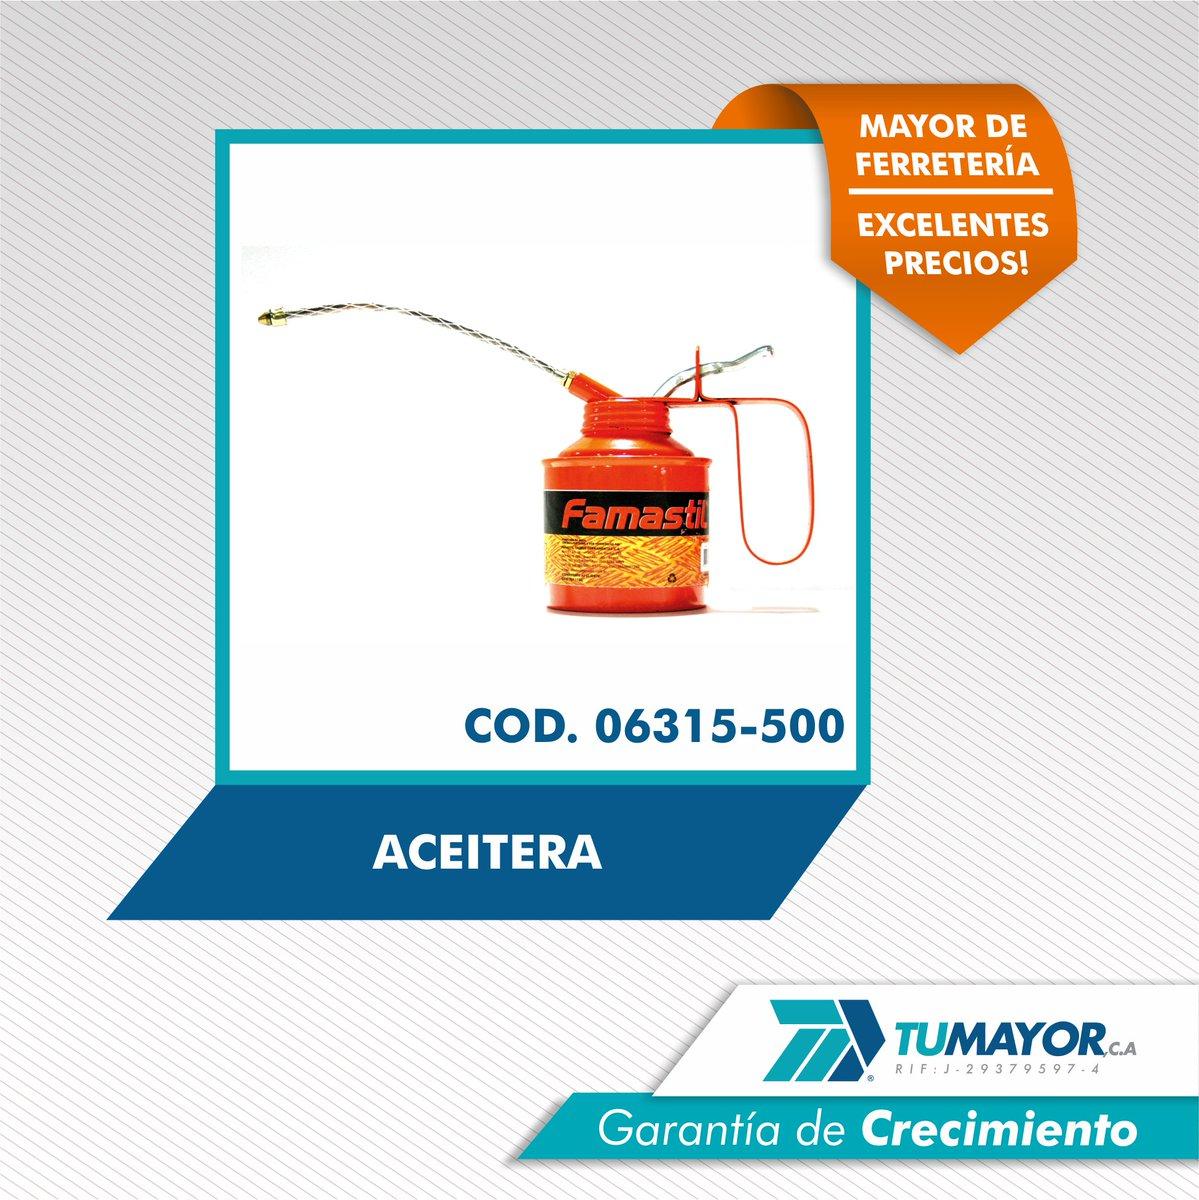 Cod. 0631-500. Aceitera. #tumayor #GarantiadeCrecimiento #productosdecalidad #calidad #ferreteros #ferreterosdevenezuela #ferreteria<br>http://pic.twitter.com/4cf6Sz1duy